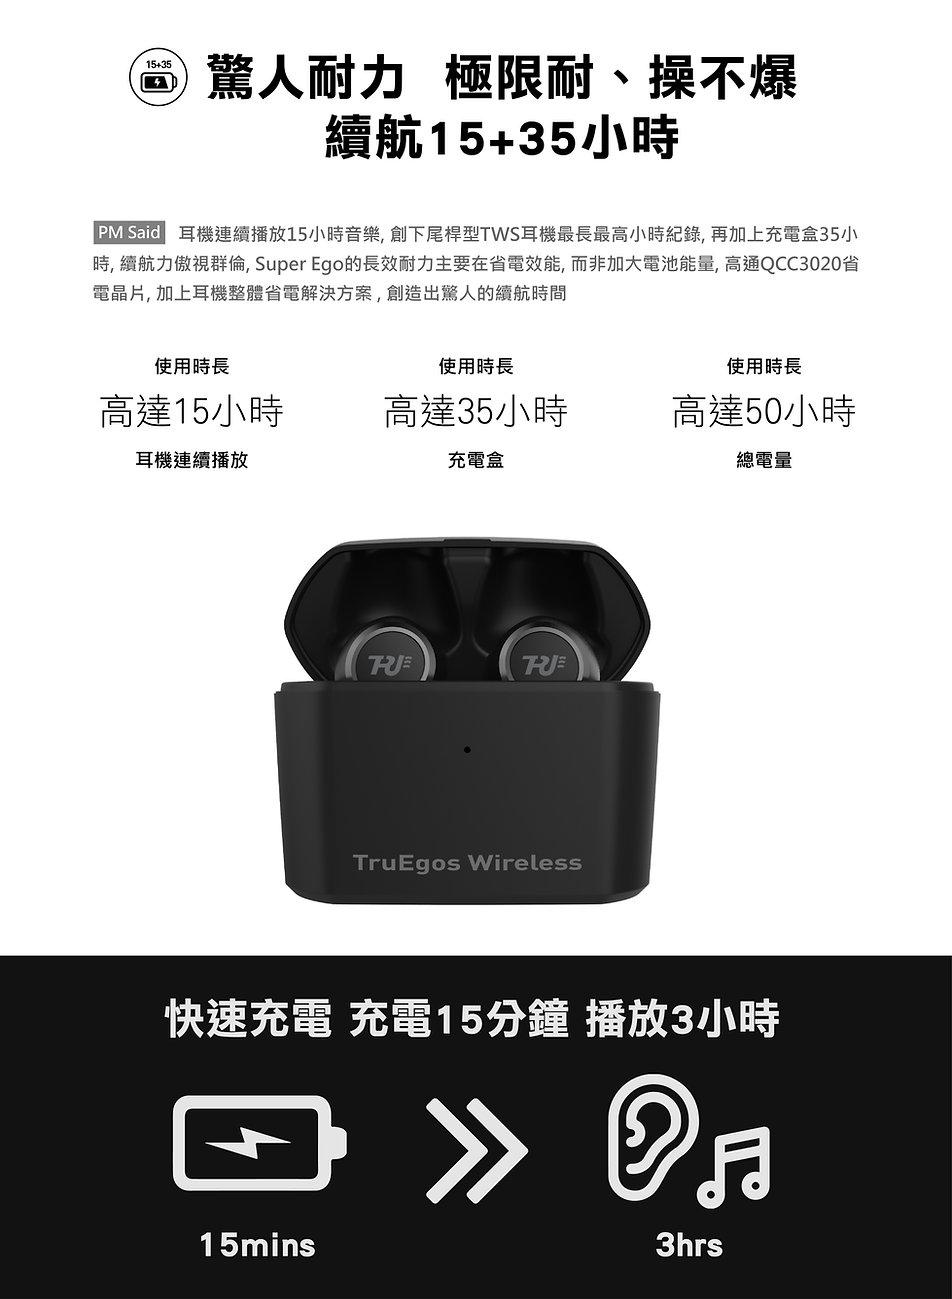 Super Ego中文_P.6.jpg